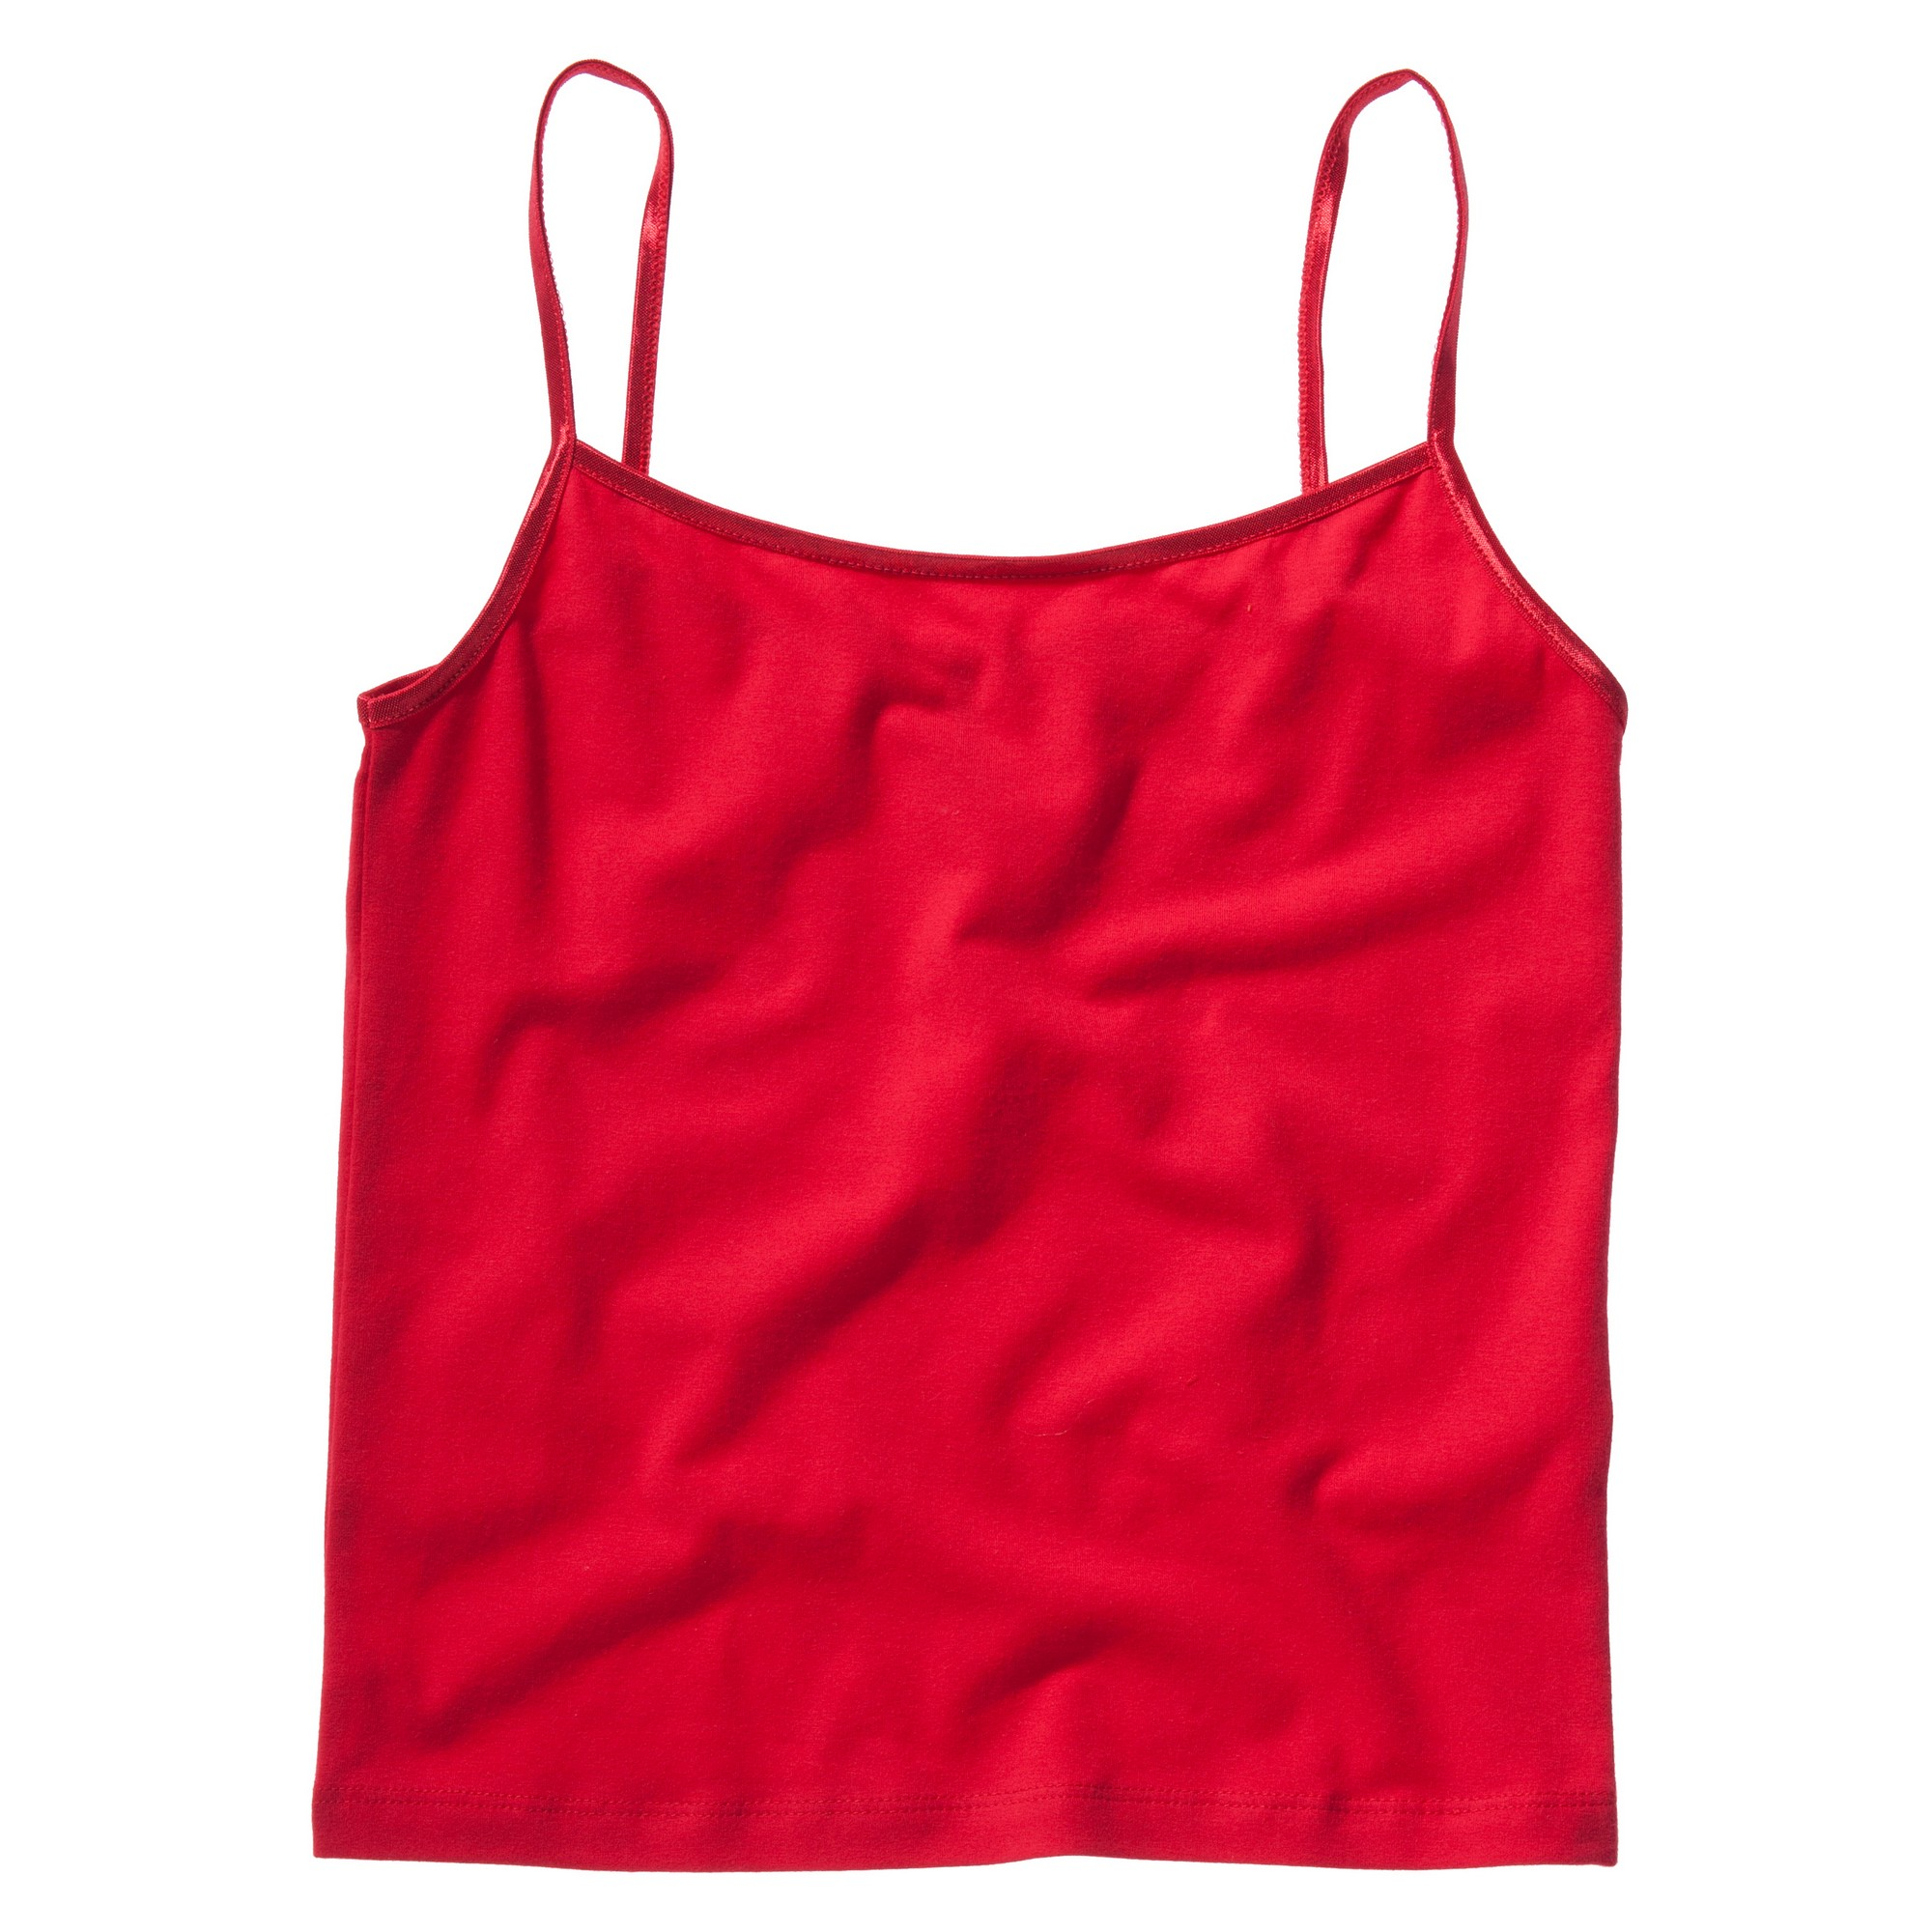 Bella + Canvas Womens/Ladies Cotton Spandex Camisole Top (S) (Red)